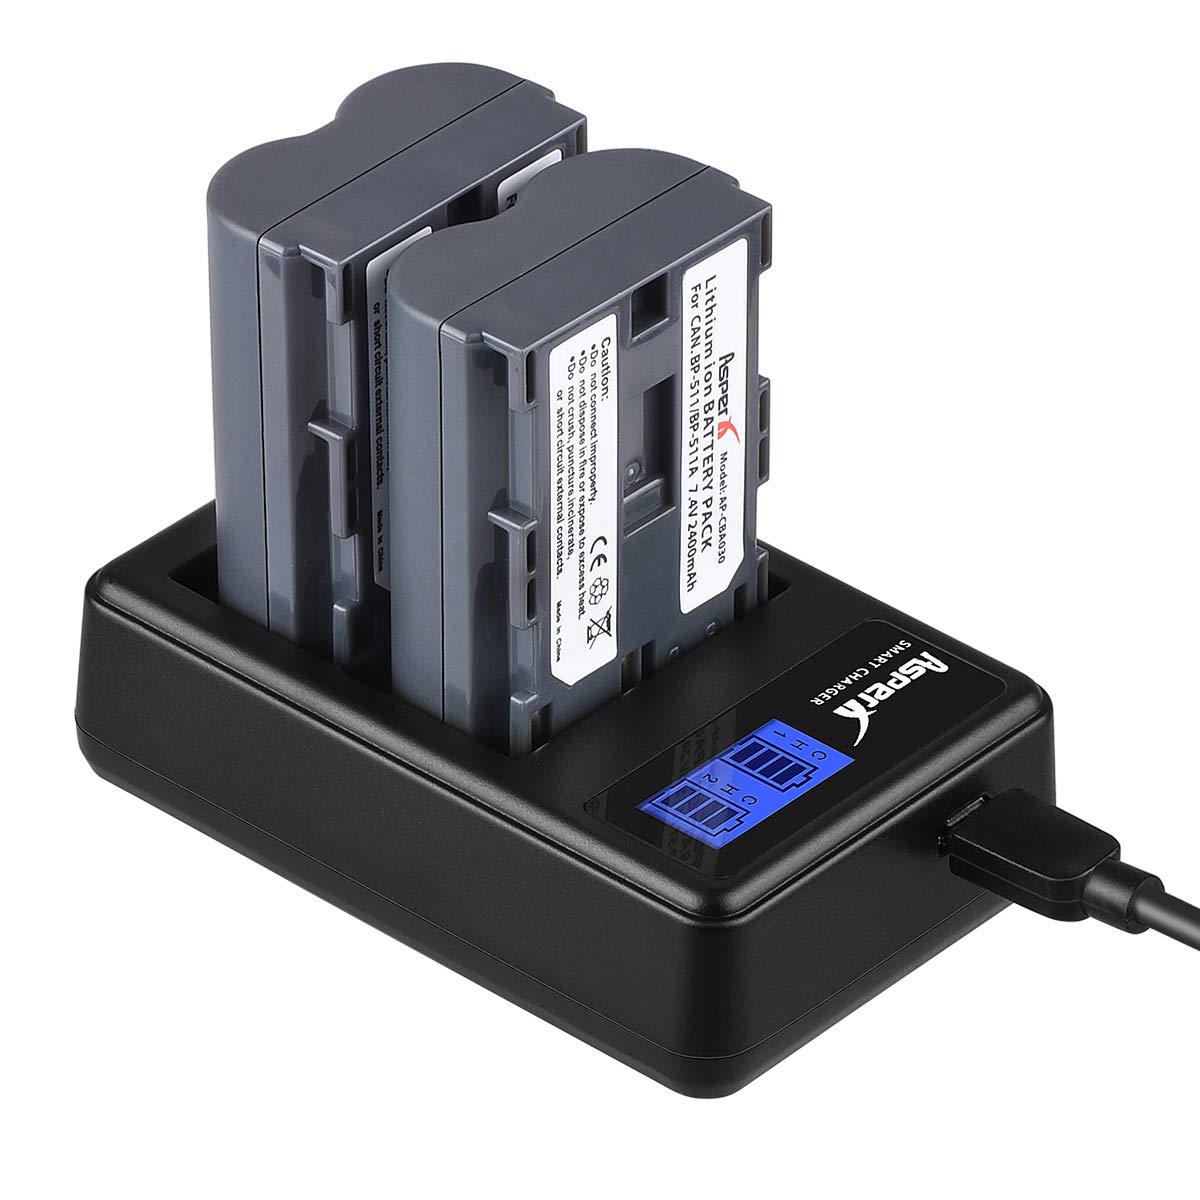 Asperx BP-511 BP-511A Replacement Battery 2 Pack and Rapid Charger for Canon EOS 50D 40D 30D 20Da 20D 10D 5D 300D Digital Rebel D30 D60 PowerShot G6 G5 G3 G2 G1 Pro 1 Pro 90 by AsperX